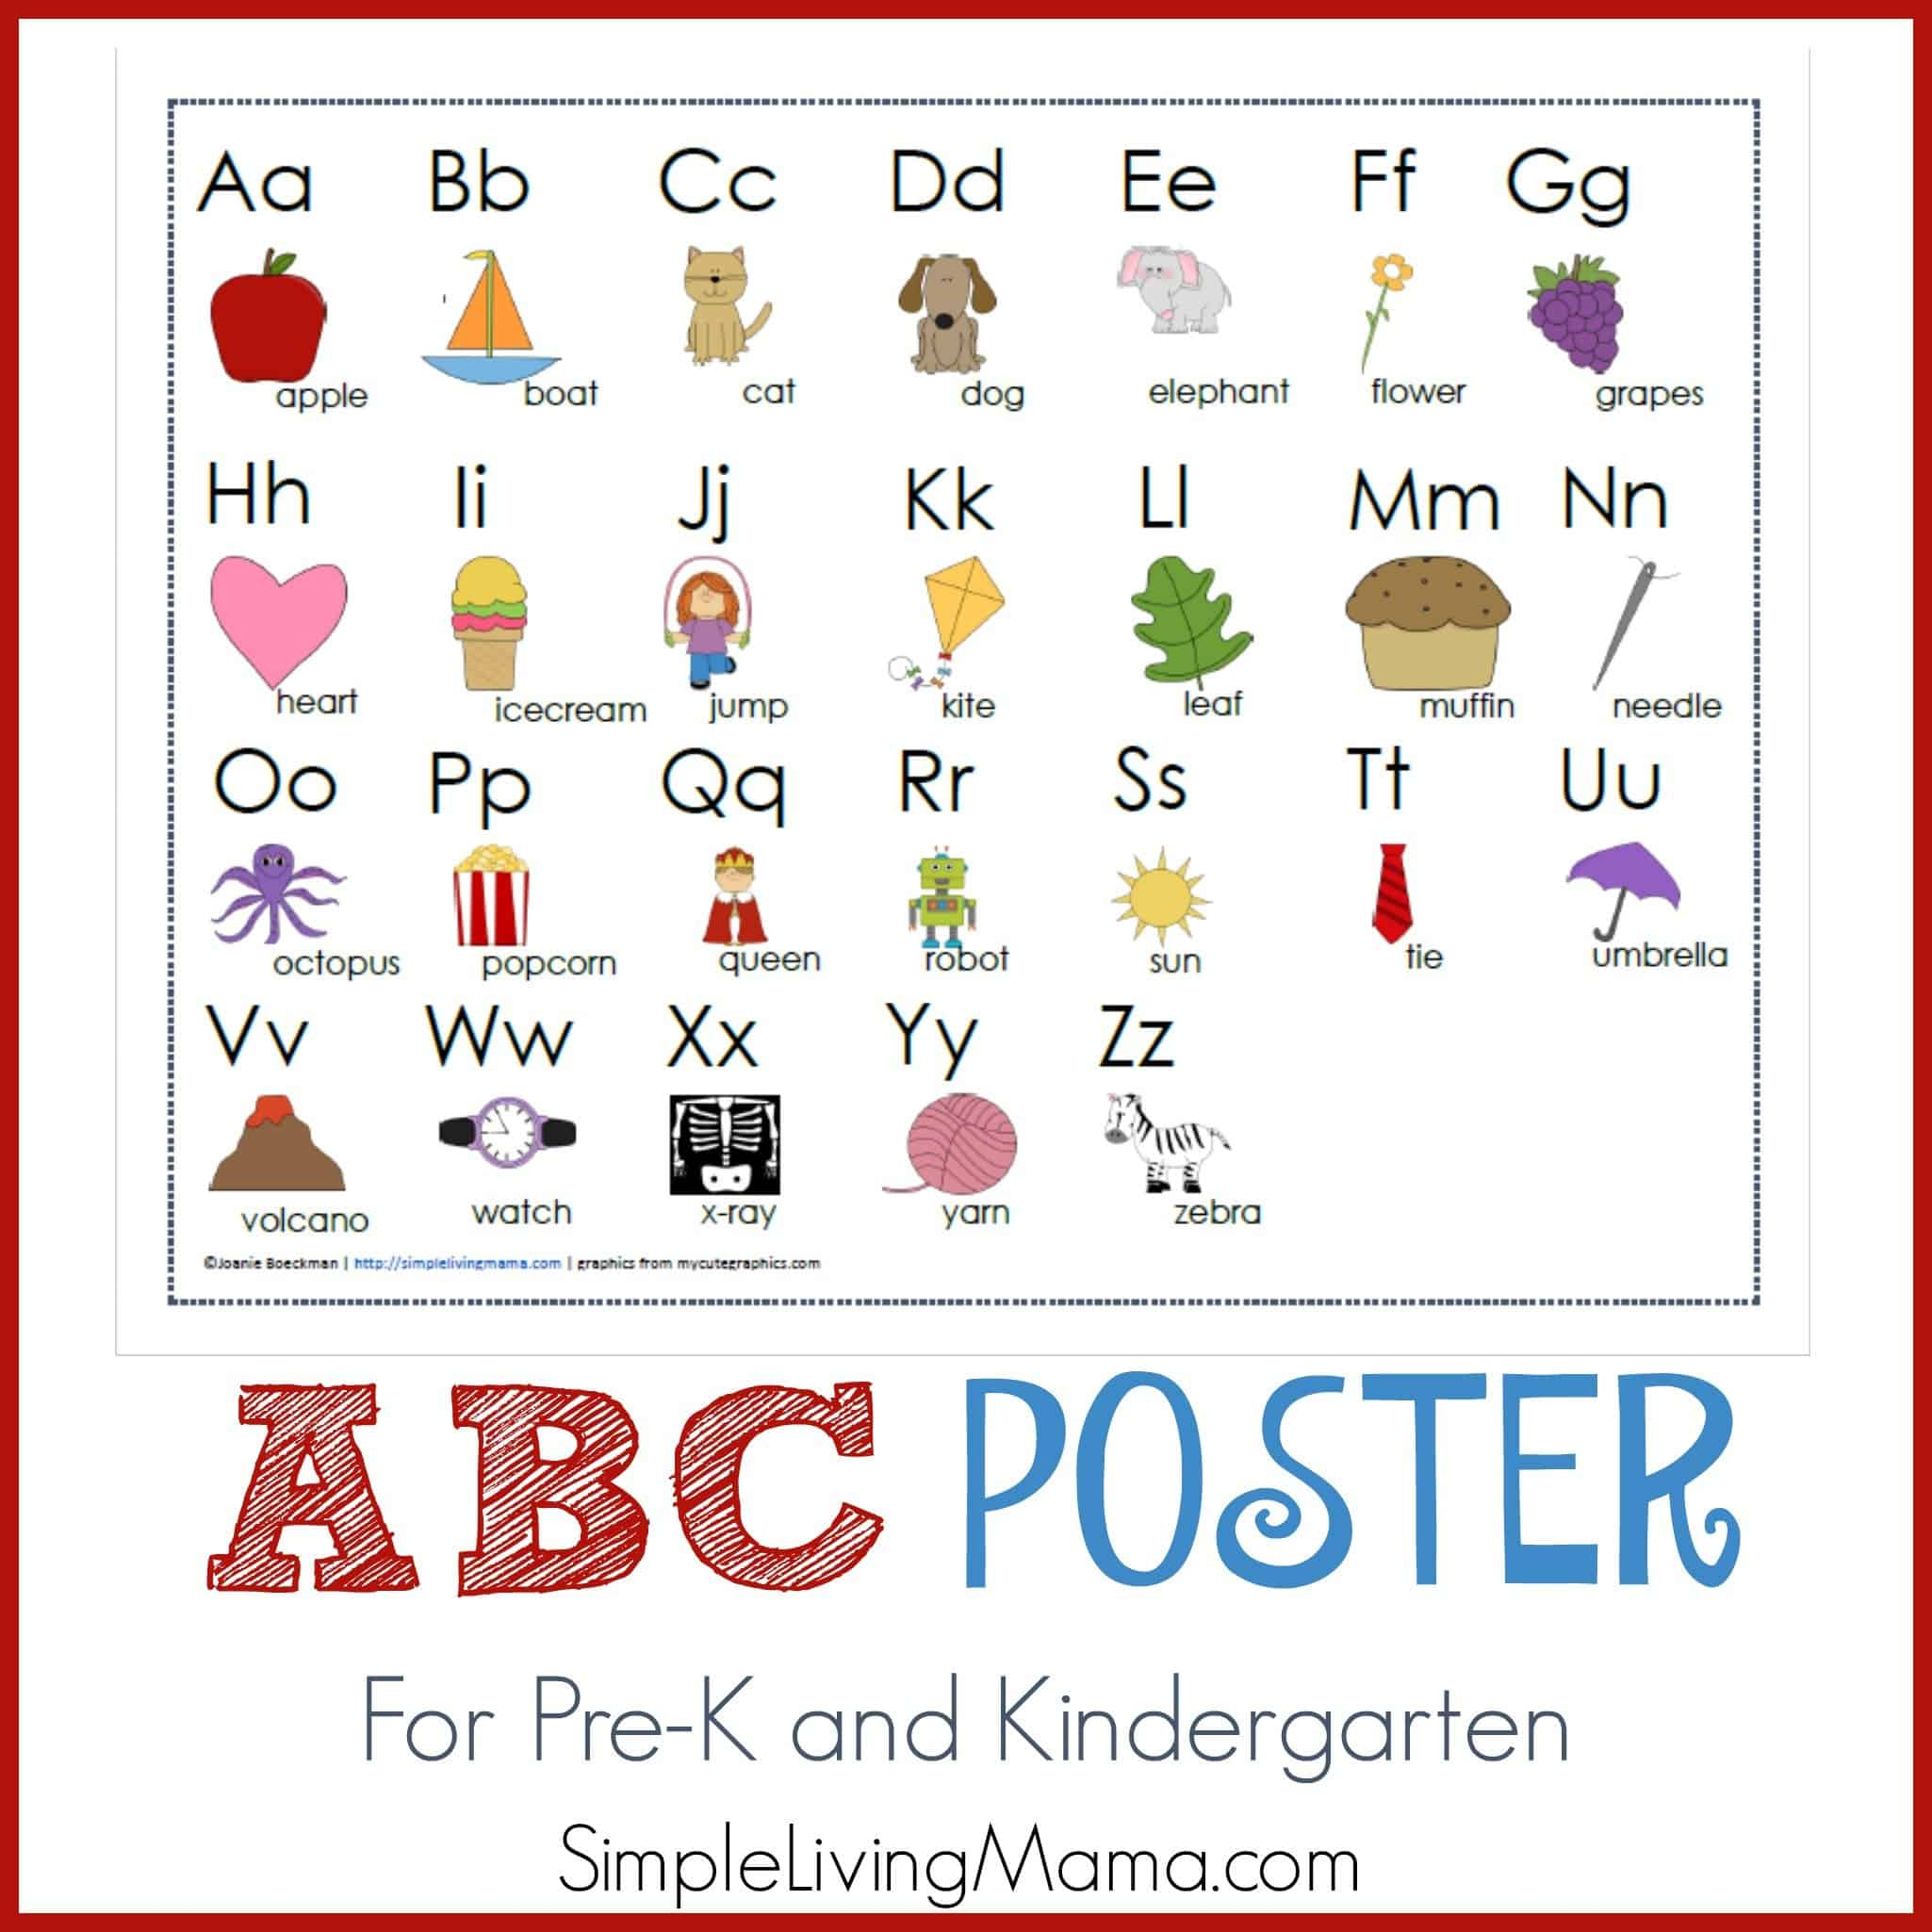 Lively Alphabet Poster Printable | Jackson Website with regard to Arabic Alphabet Poster Printable